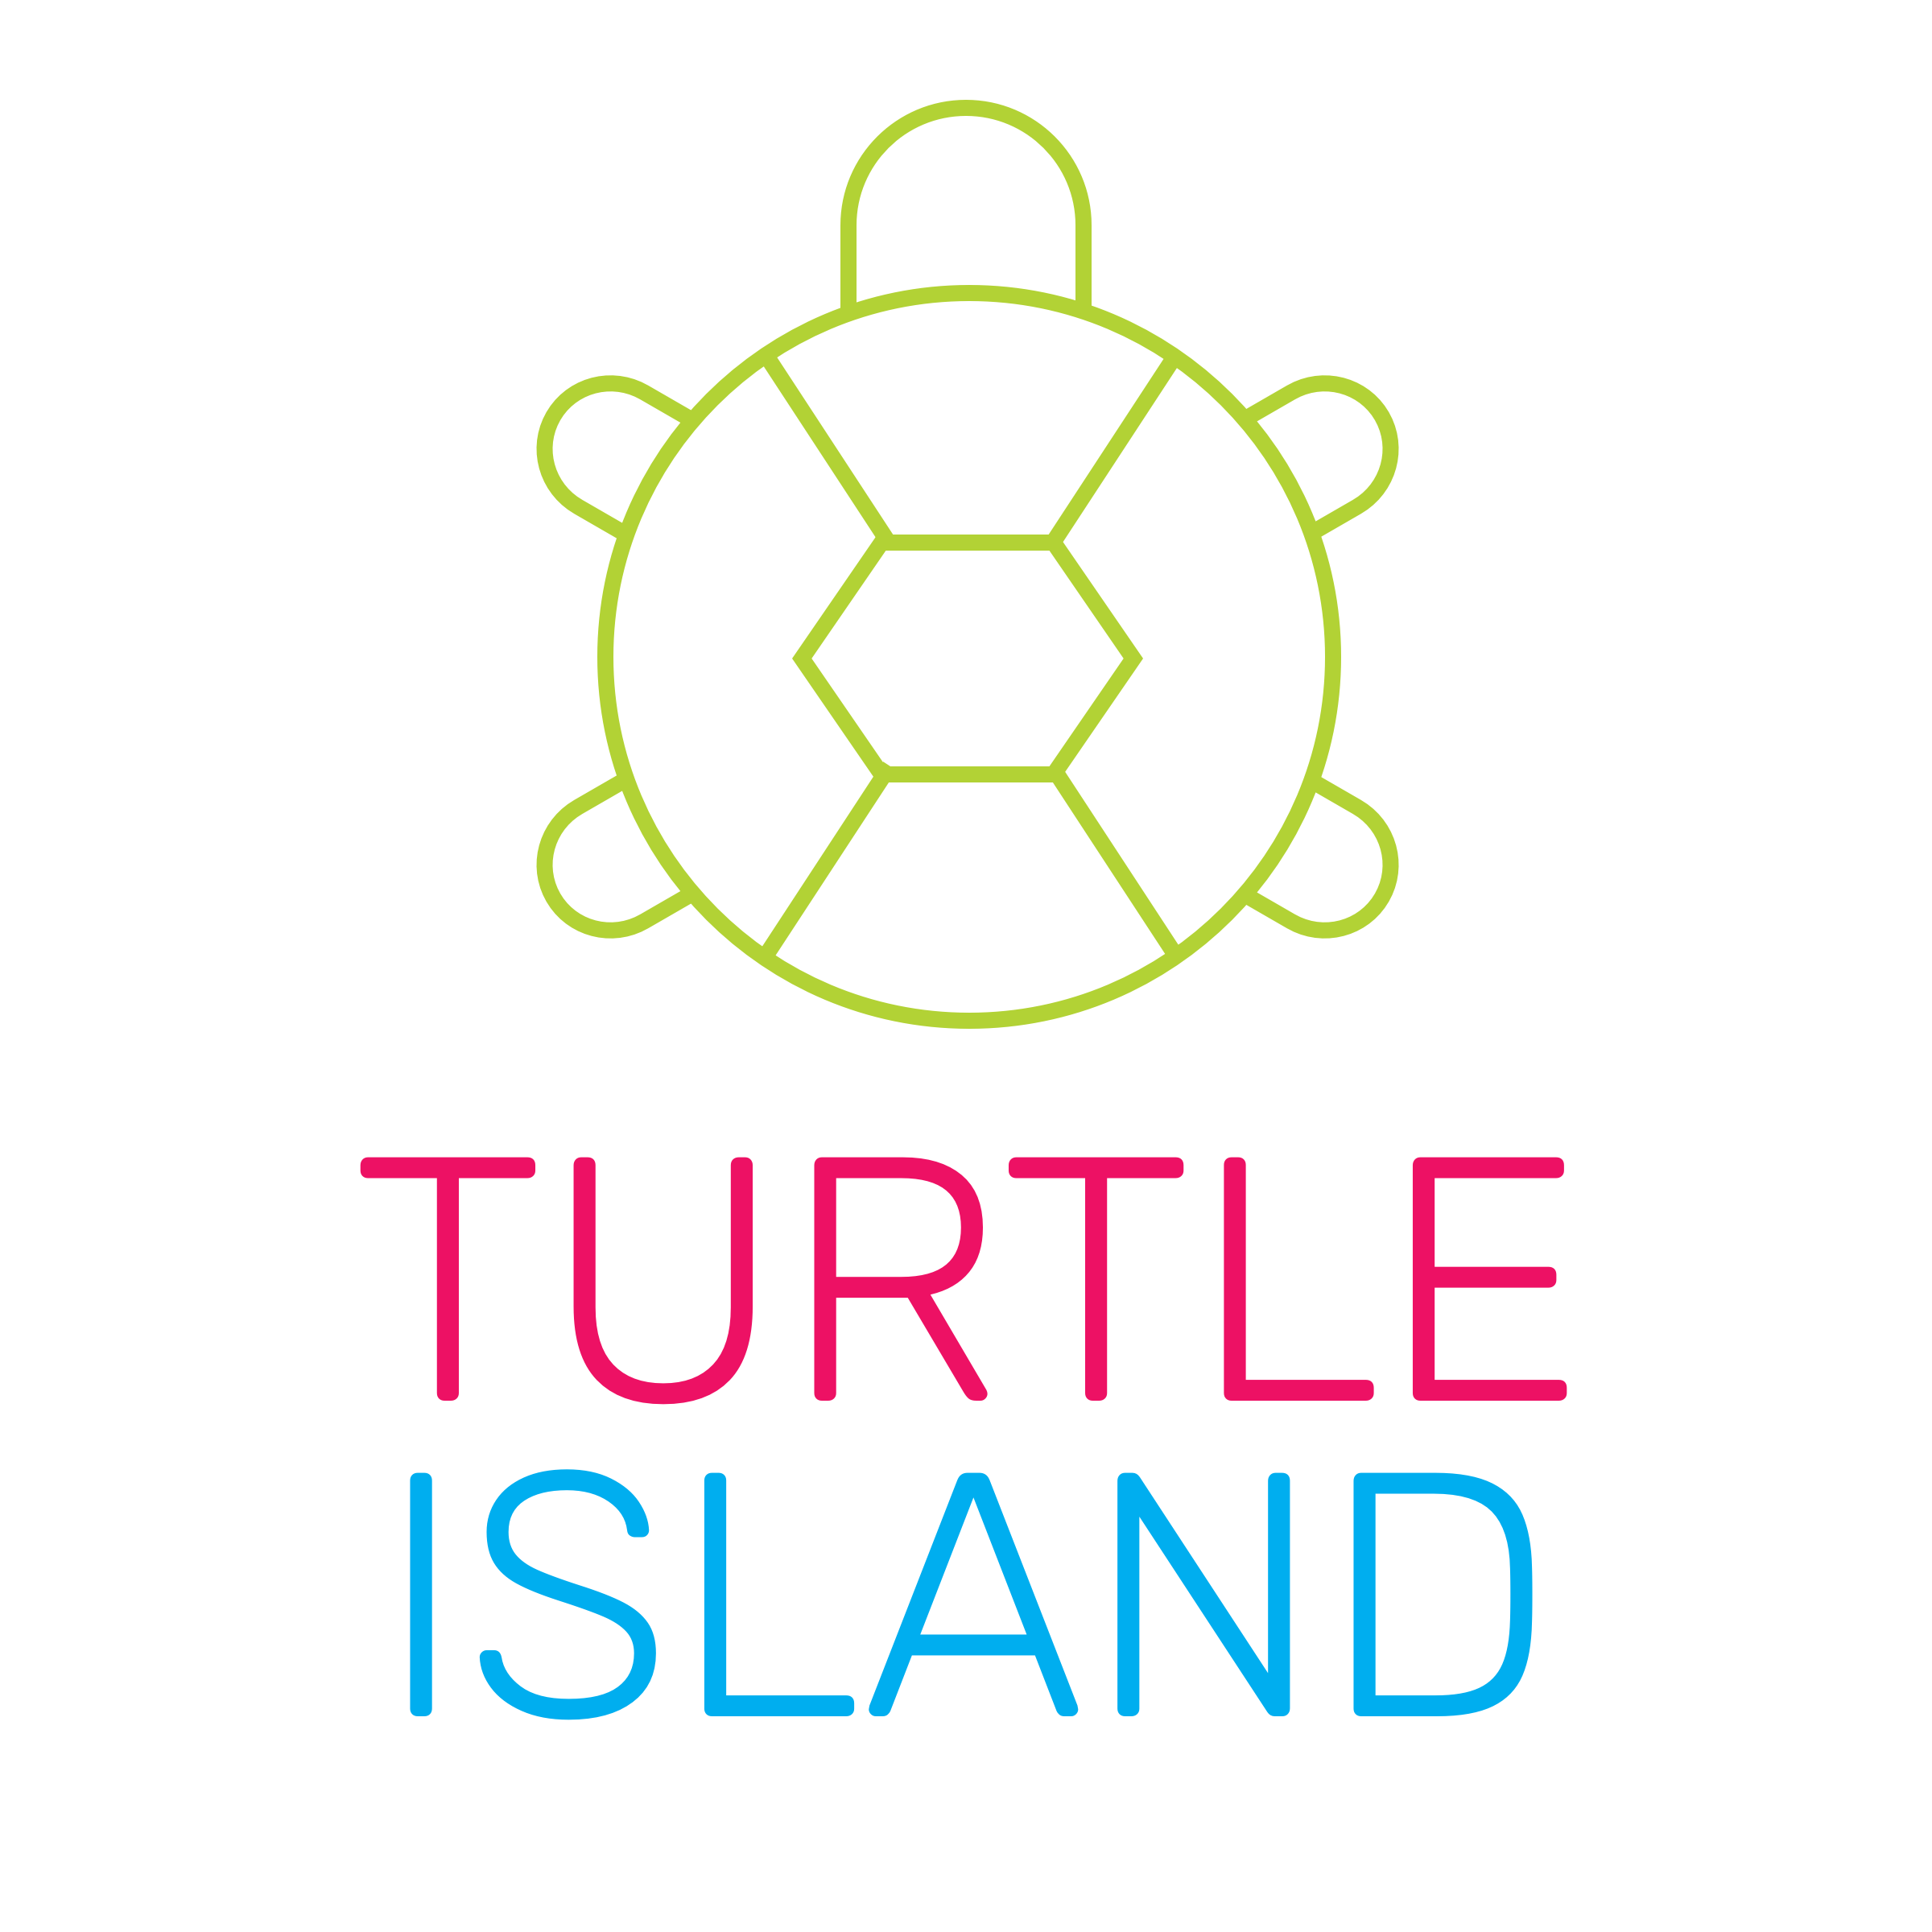 turtle-island .png